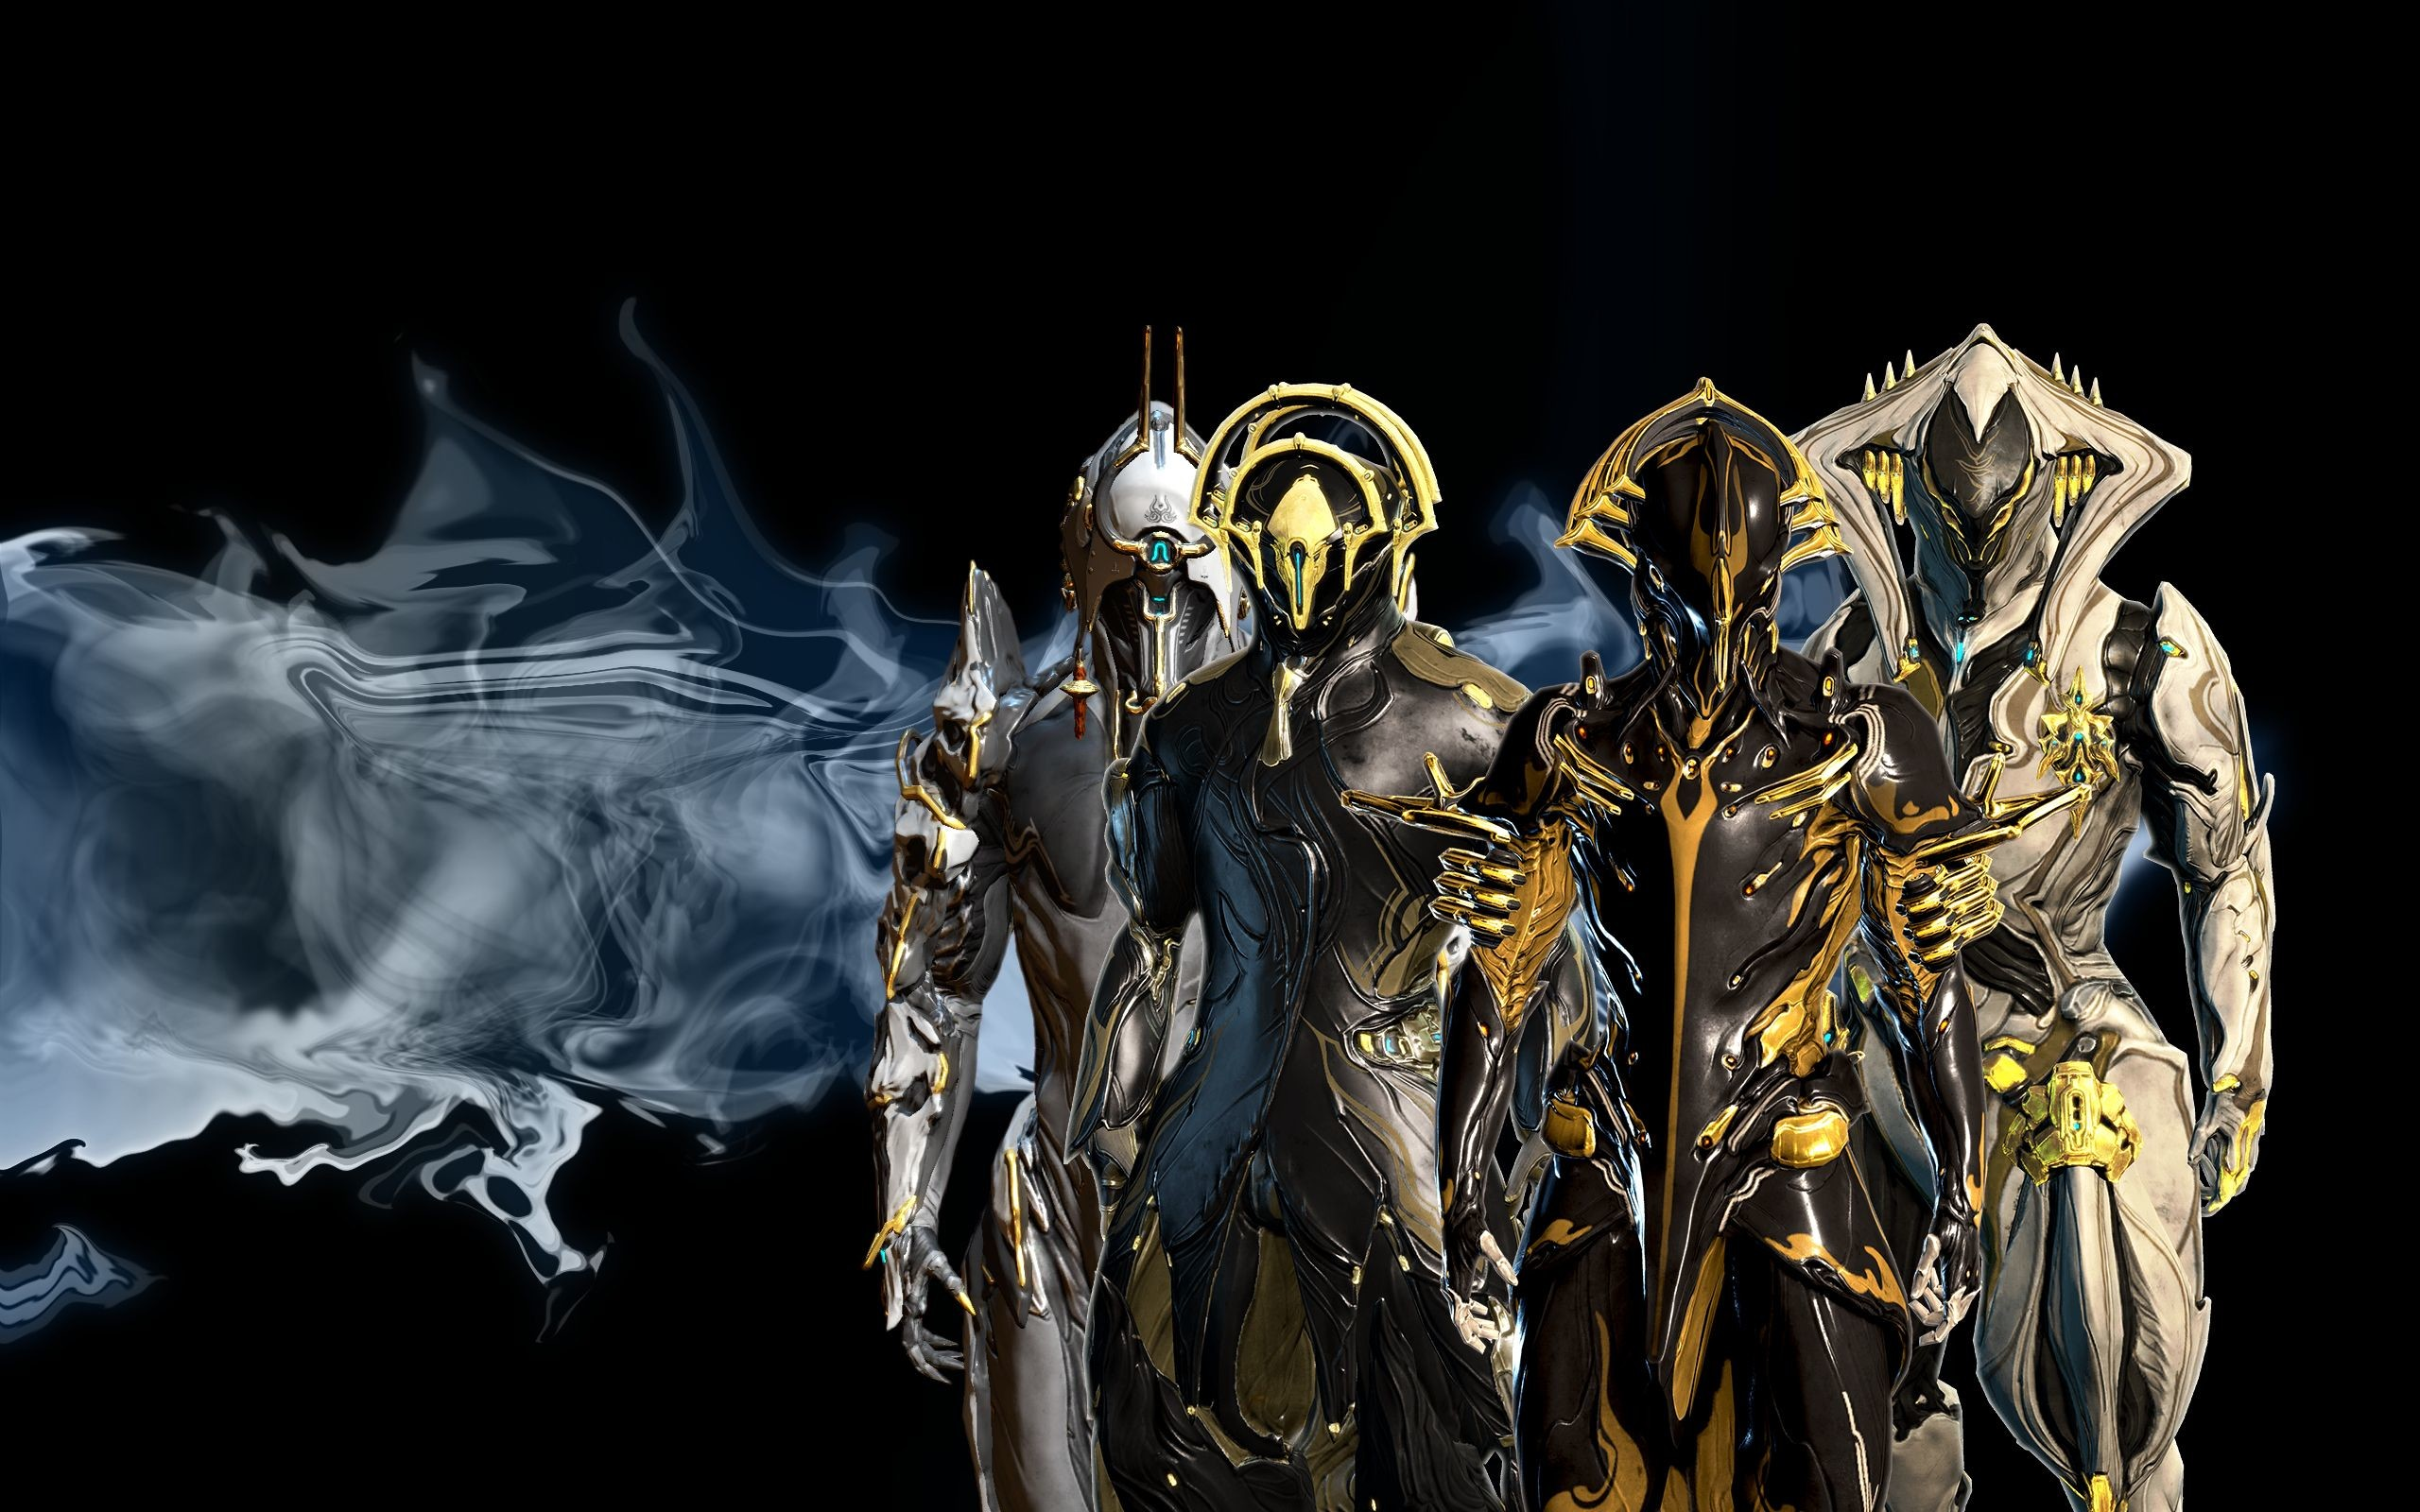 Res: 2560x1600, Ash Frost Volt & Loki Prime Wallpaper. Enjoy :)